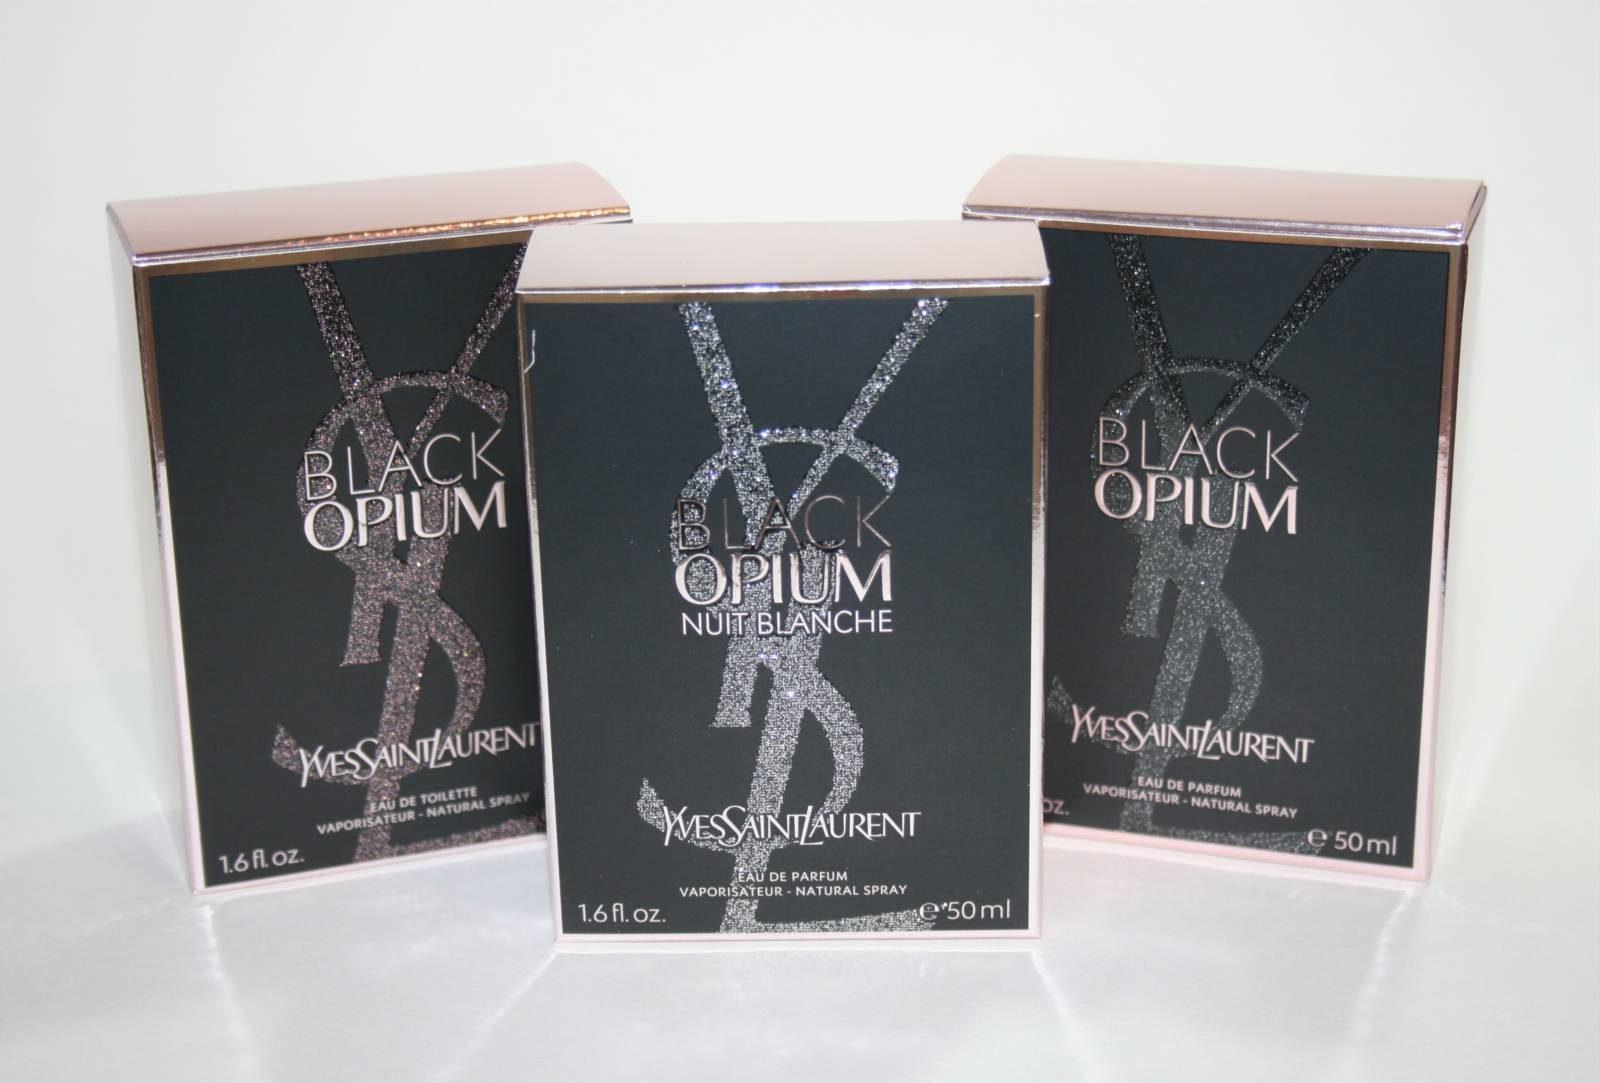 ysl-black-opium-trio-review